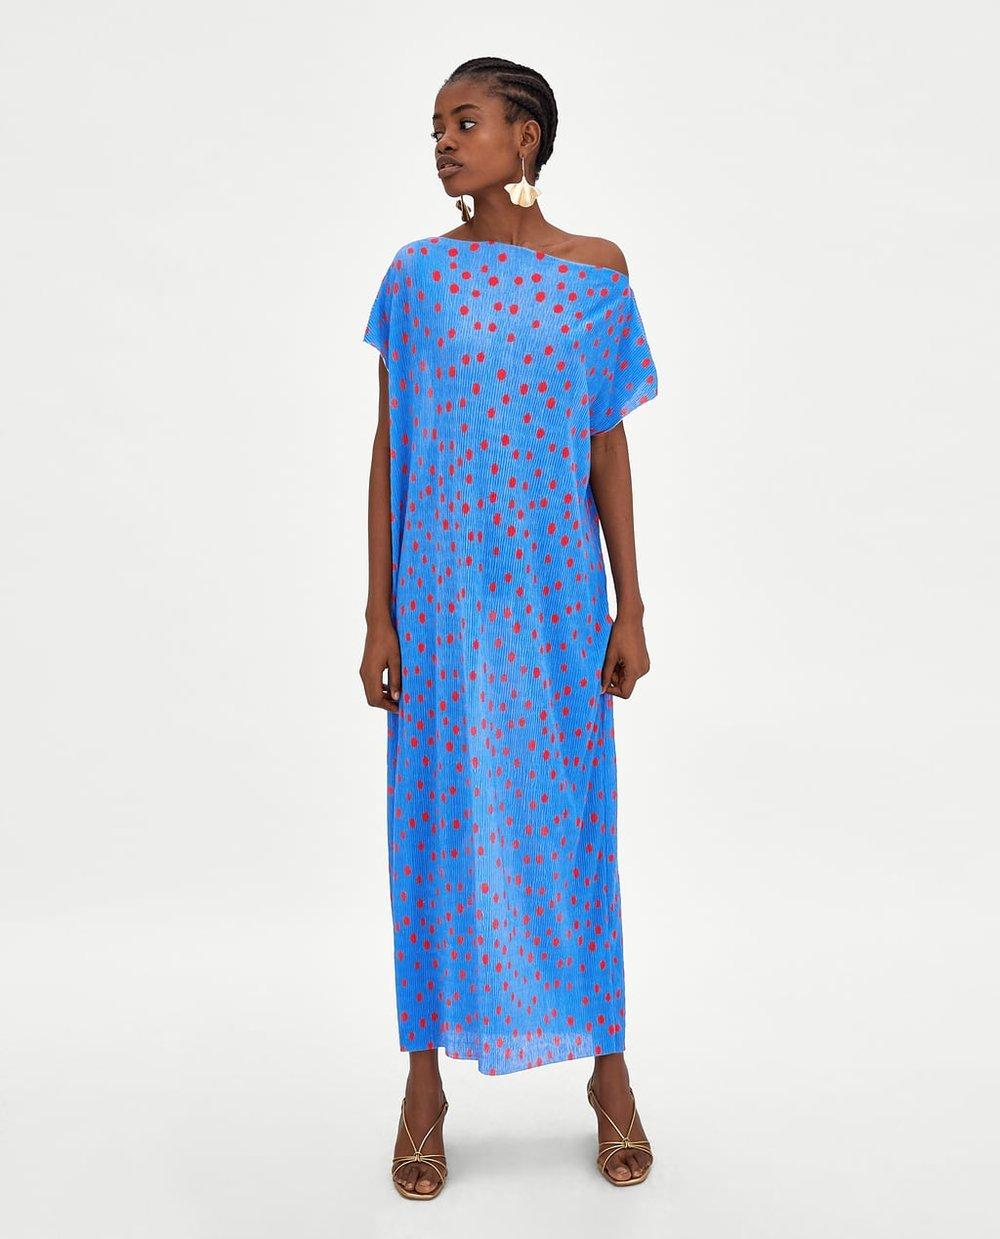 Zara Pleated Polka Dot Dress.jpg